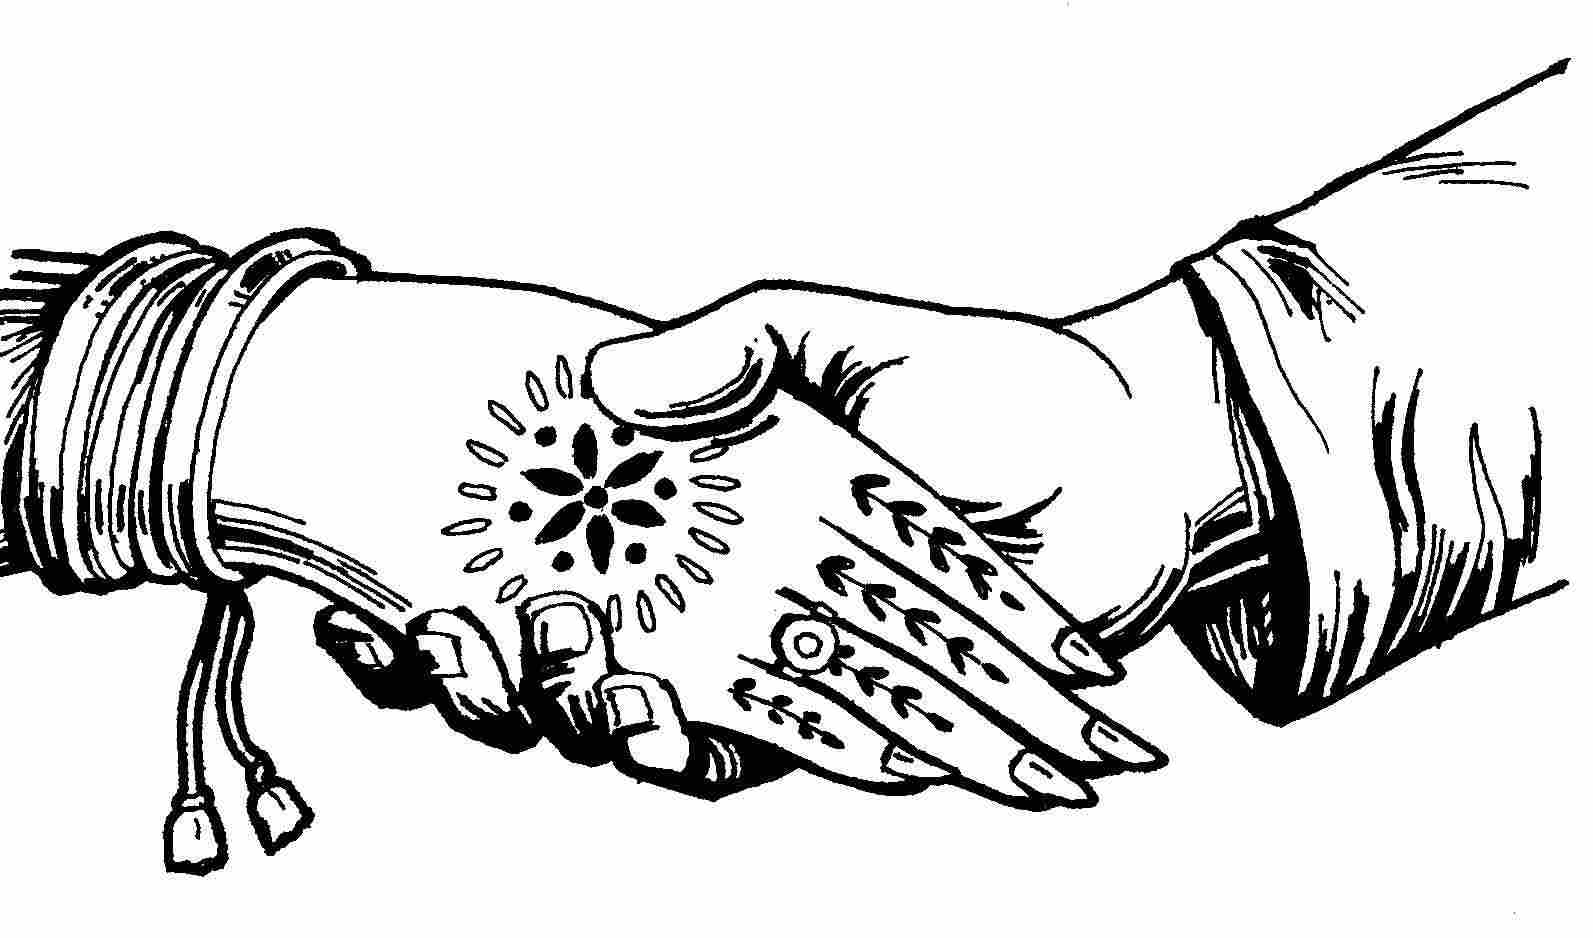 Single Line Symbol Art : Marriage symbol line art clipart best